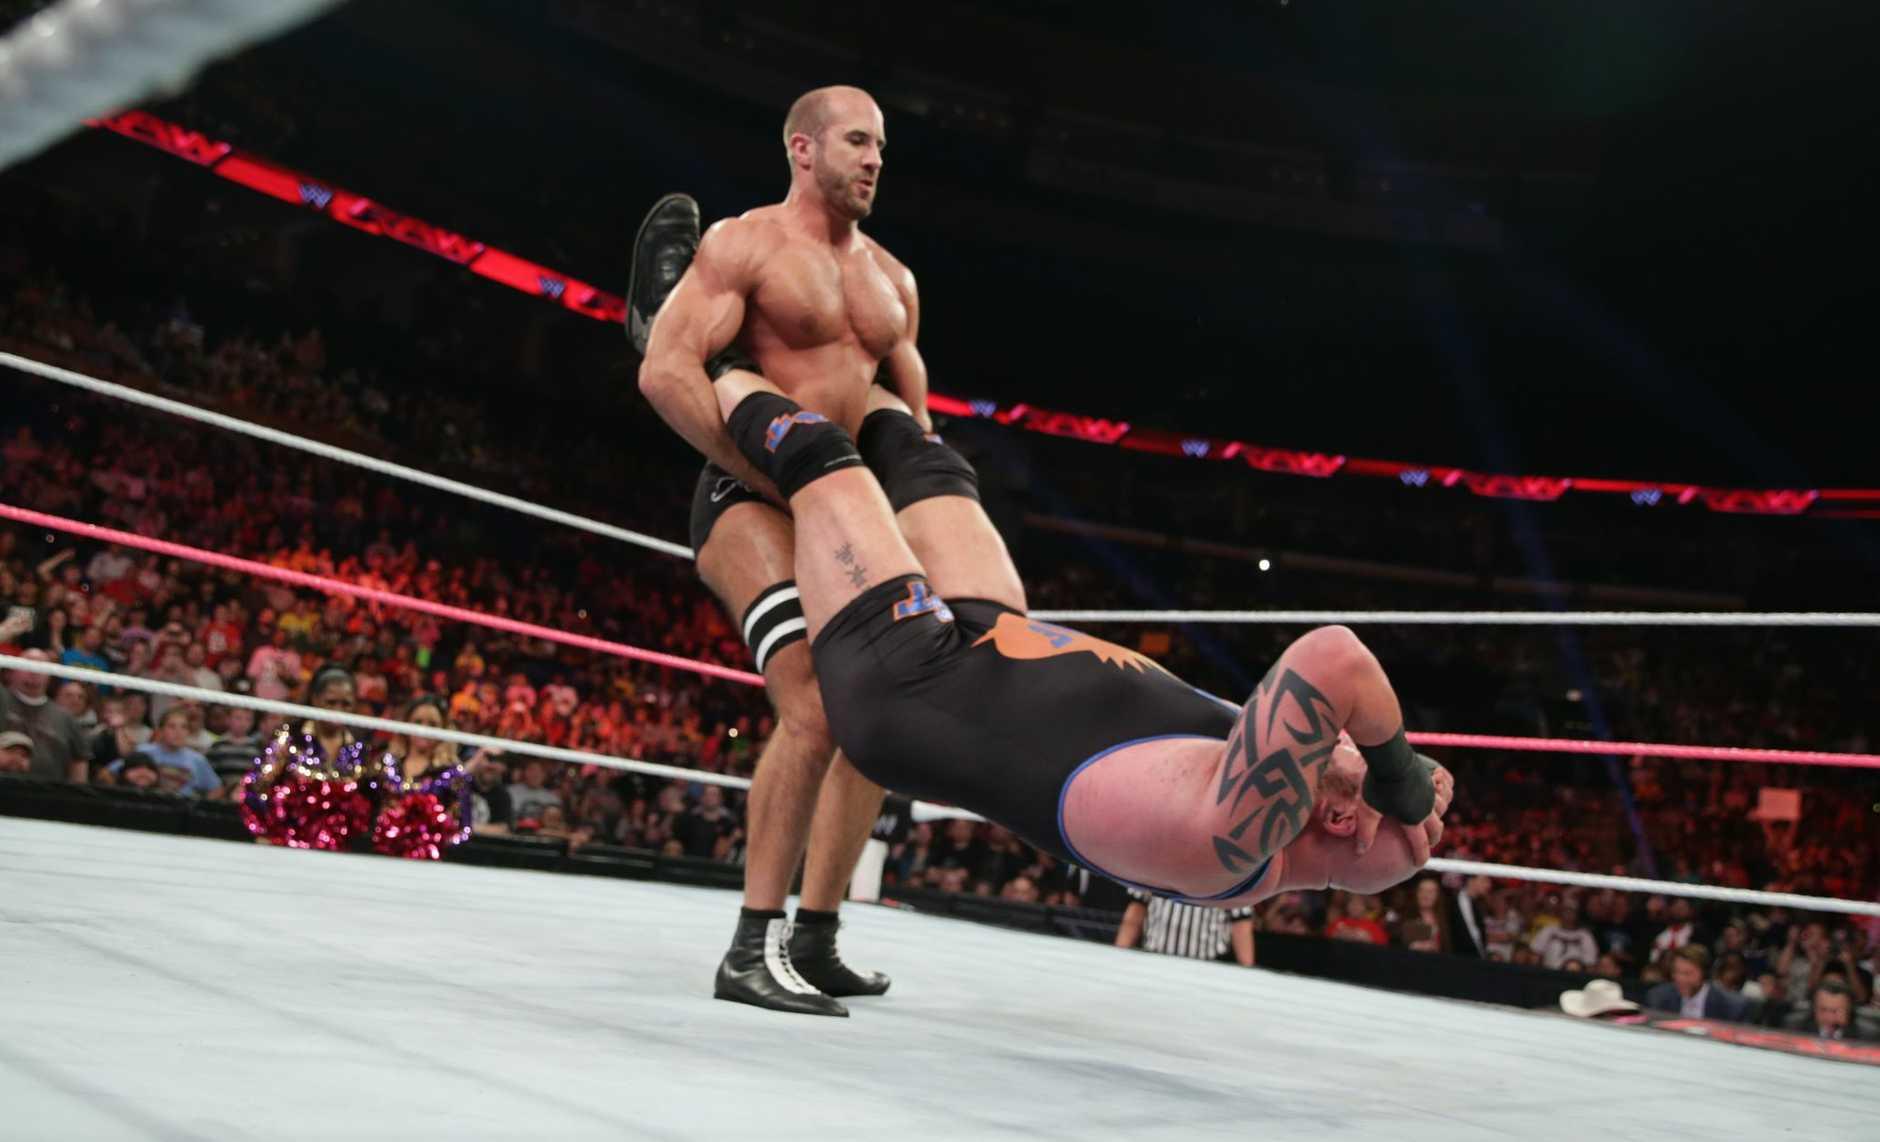 WWE Superstar Antonio Cesaro performing the Cesaro Swing. He set the record, 31 times around, in Australia.